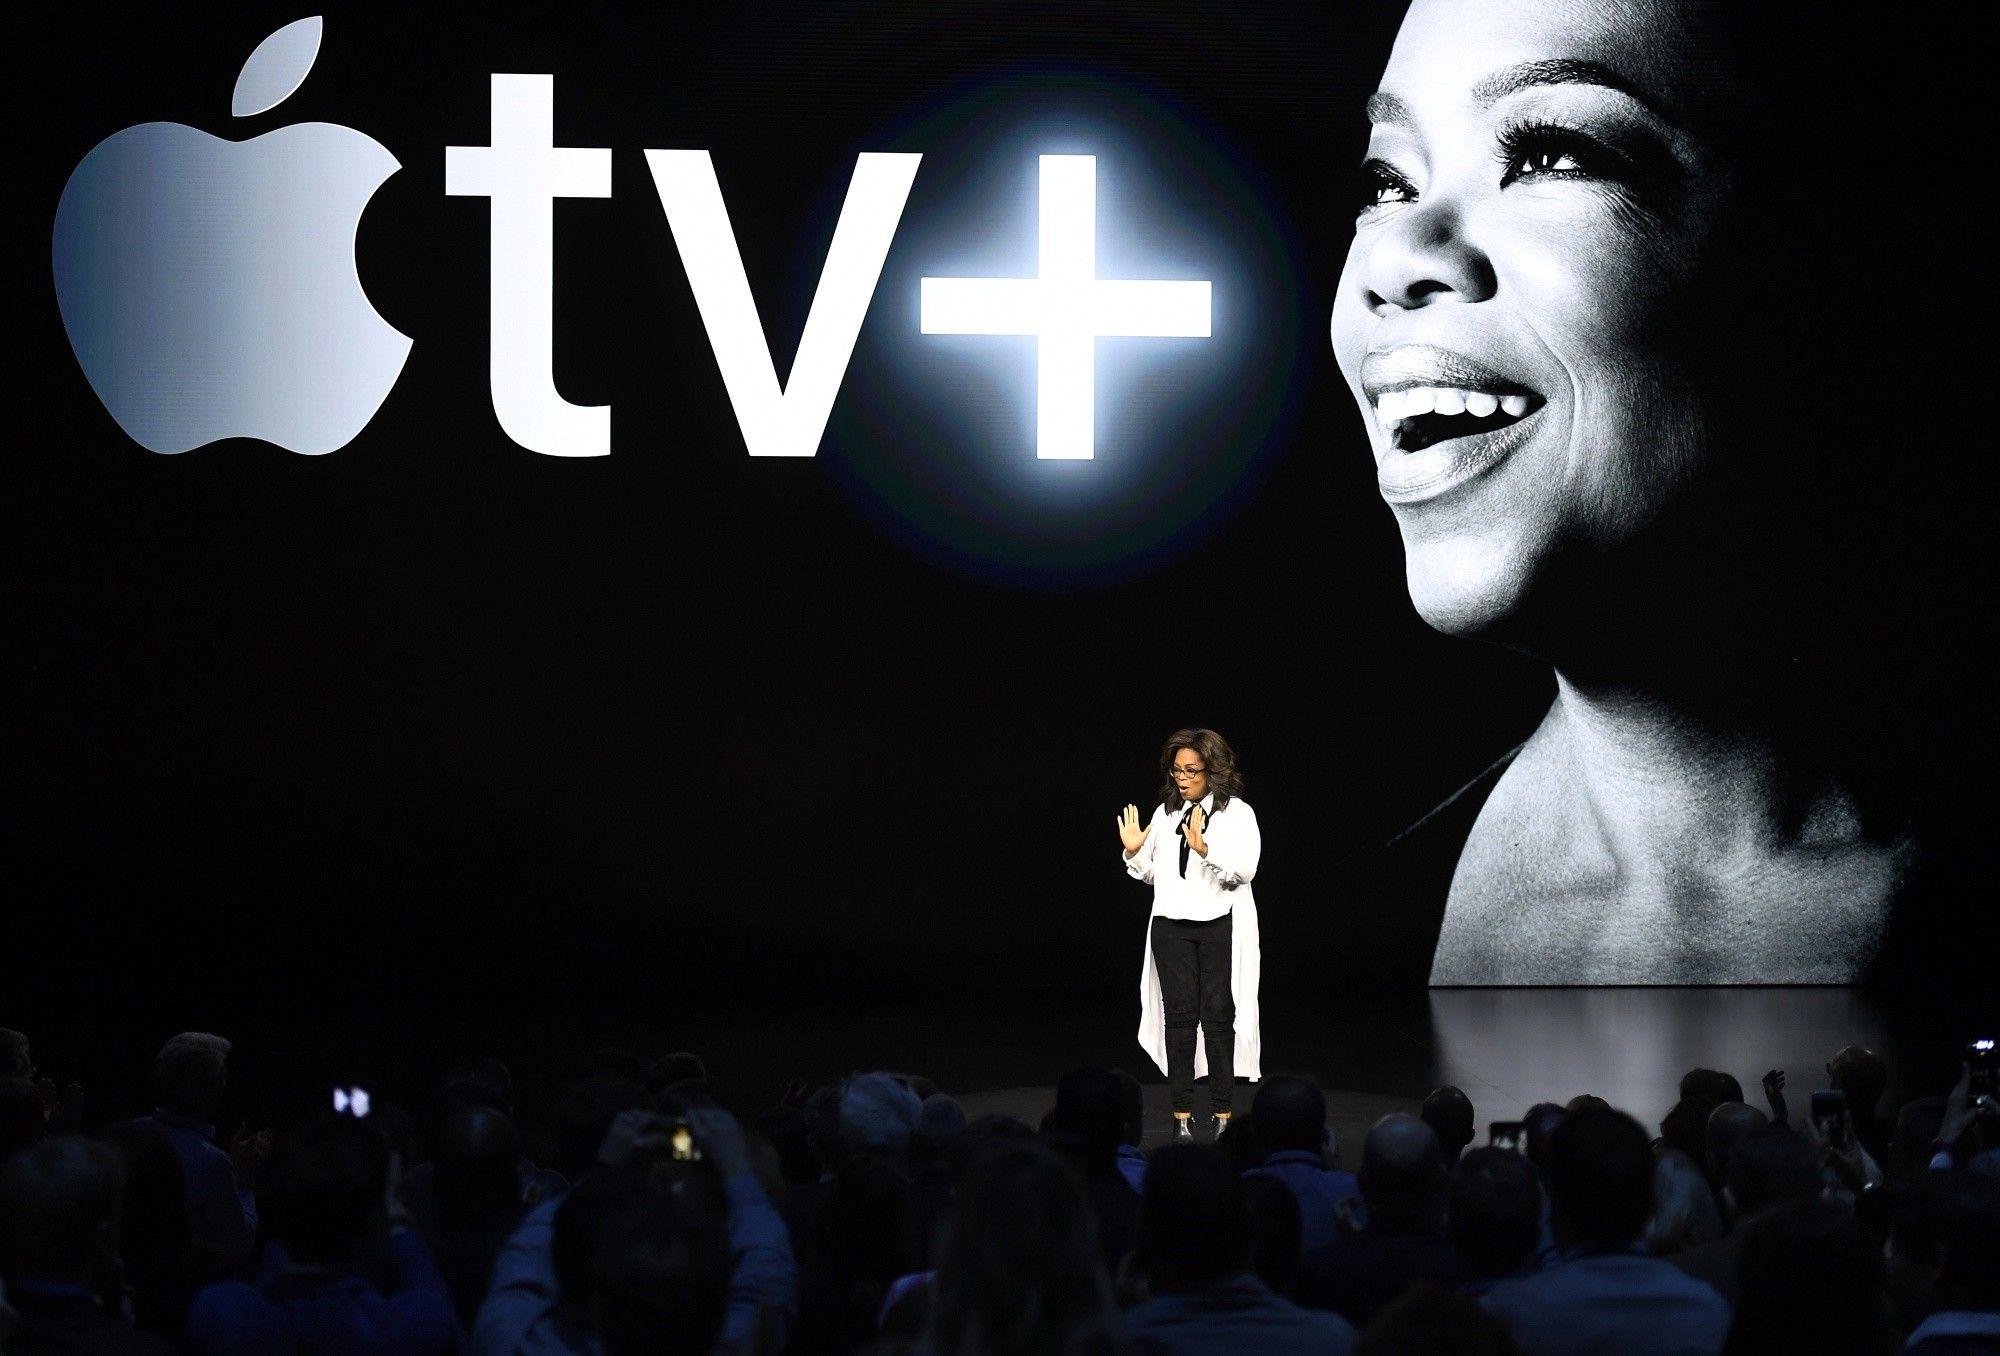 Apple Shows Off Apple TV+ Video Service, Taking on Netflix